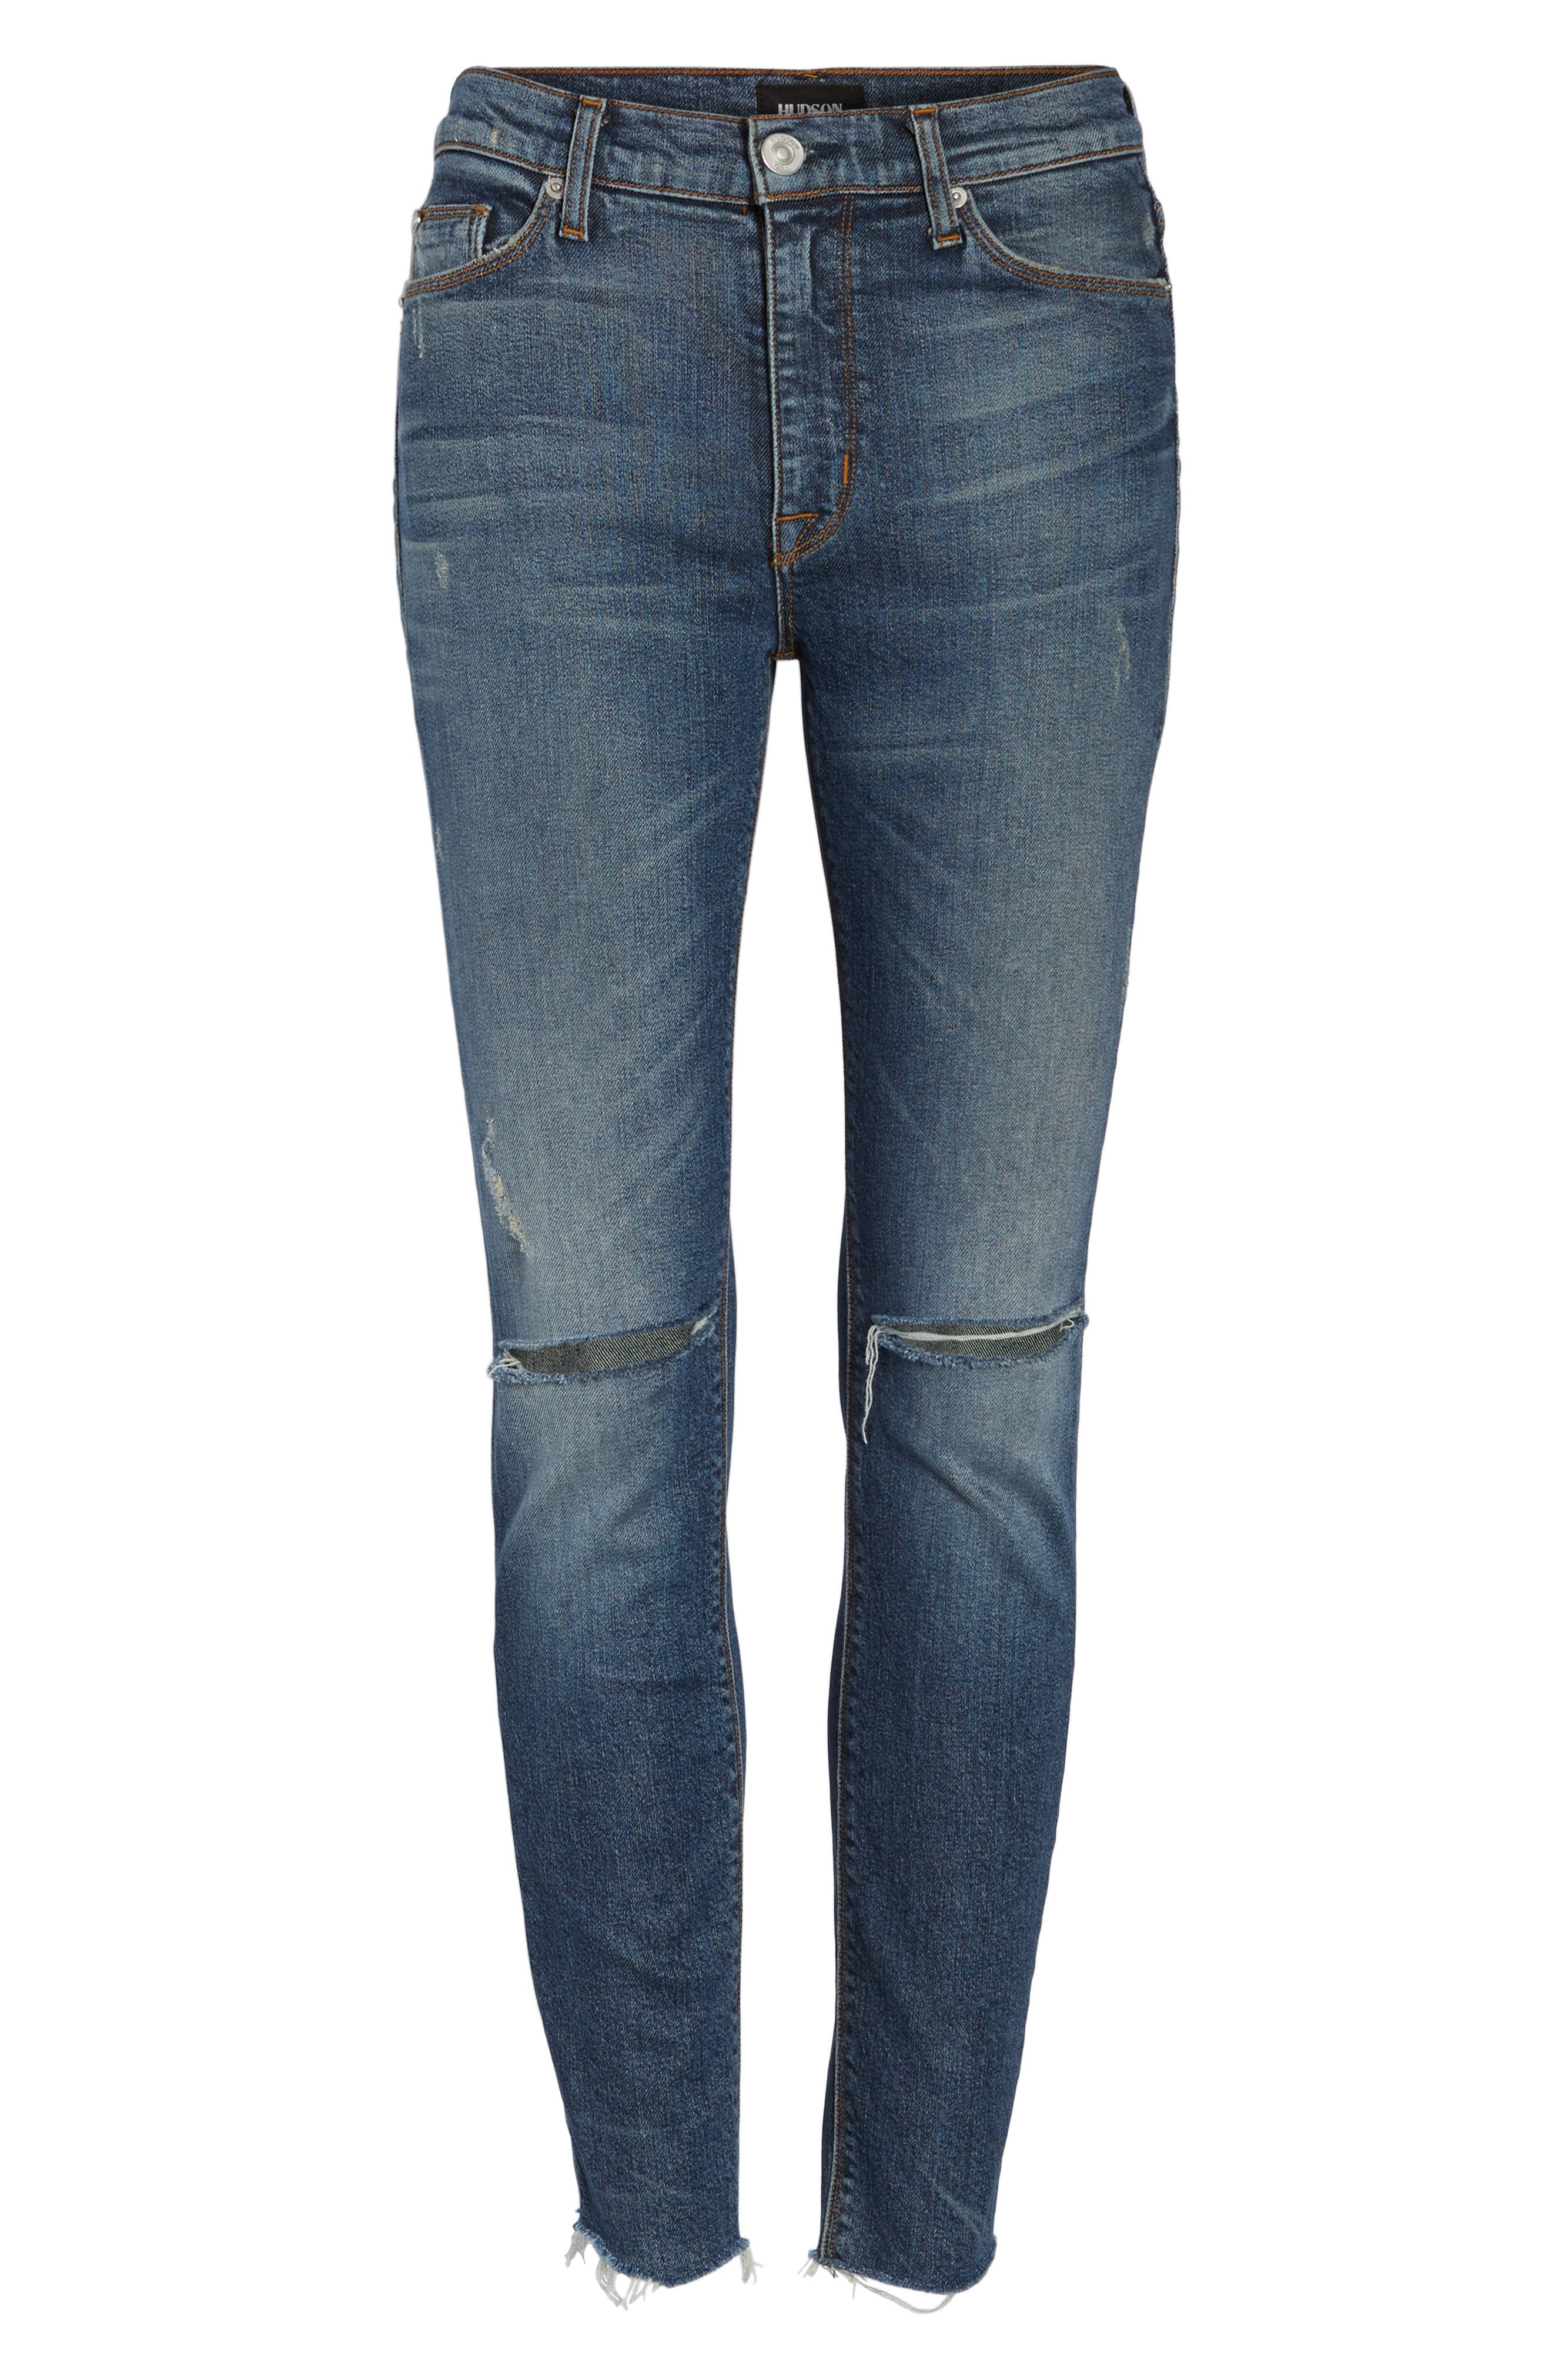 Barbara High Waist Skinny Jeans,                             Alternate thumbnail 6, color,                             Nowhere Girl